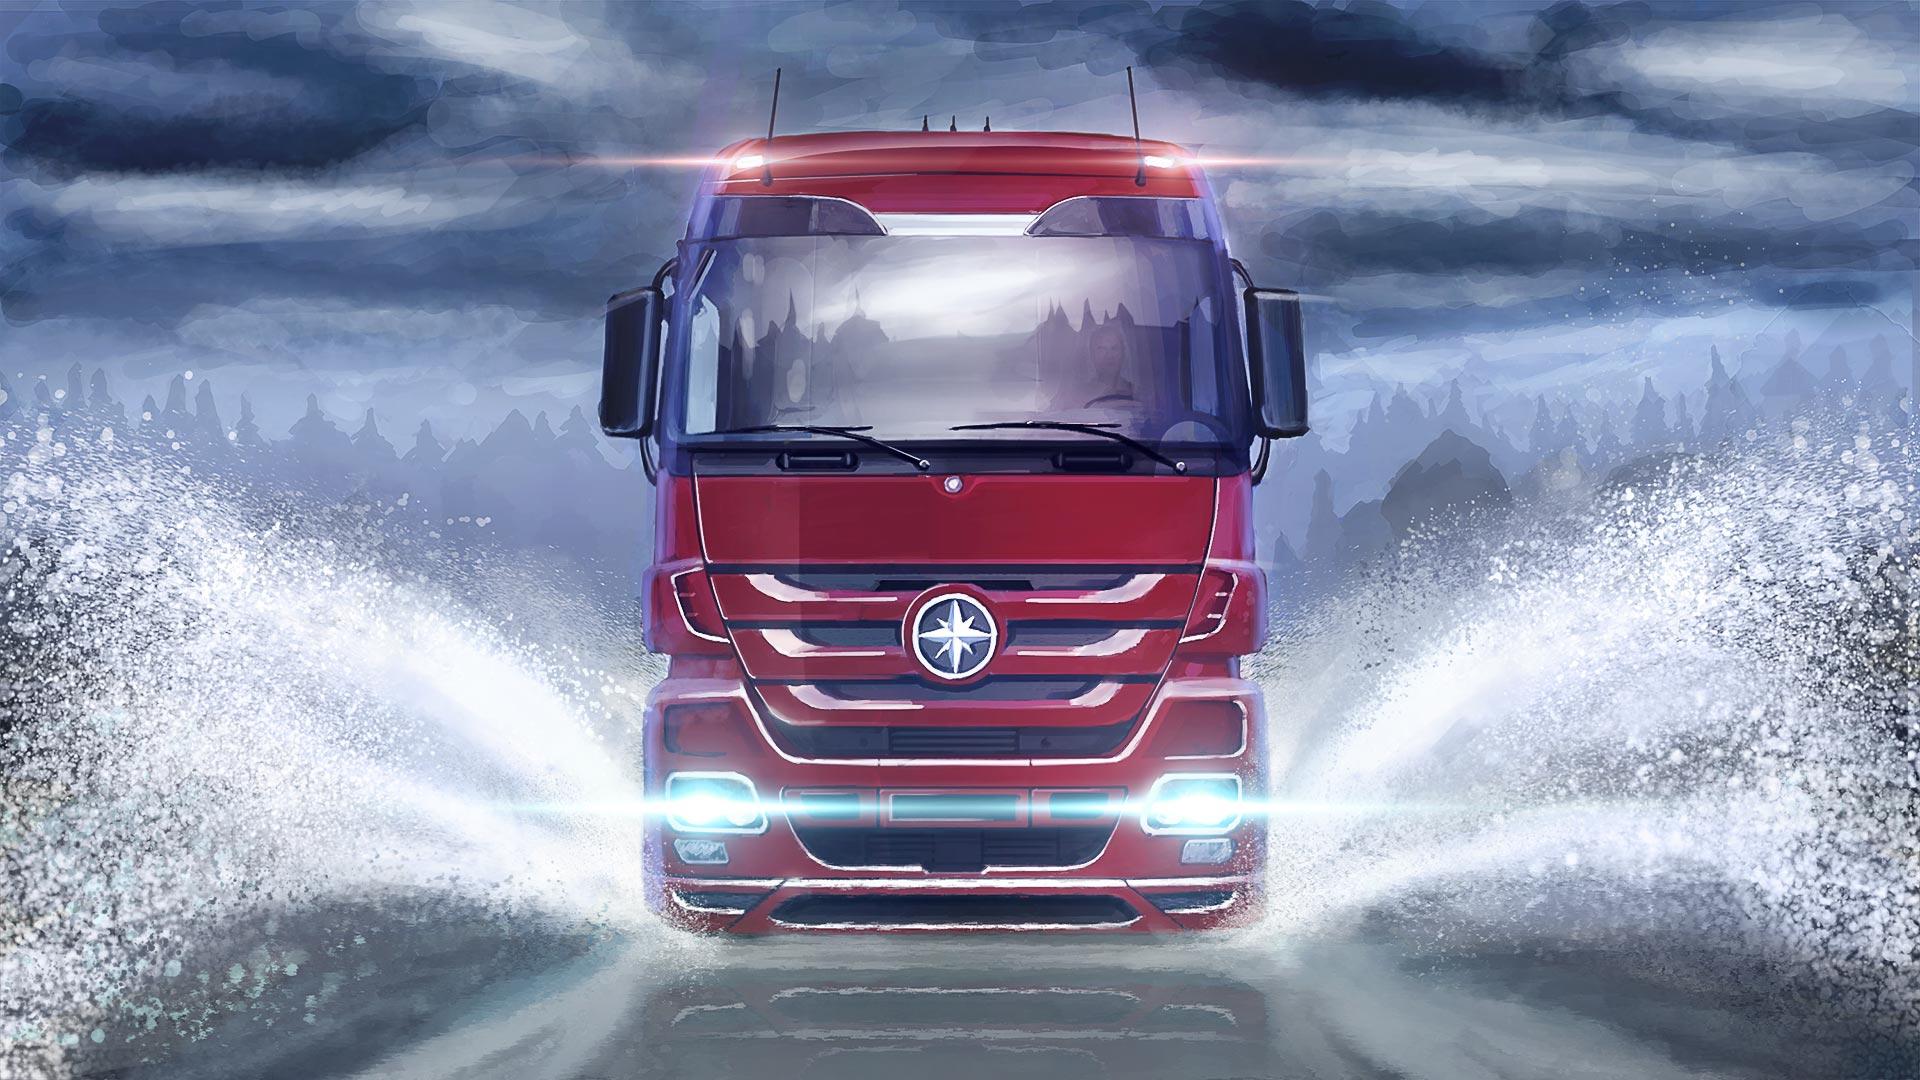 Image Euro Truck Simulator 2 Artwork 6 Jpg Steam Trading Cards